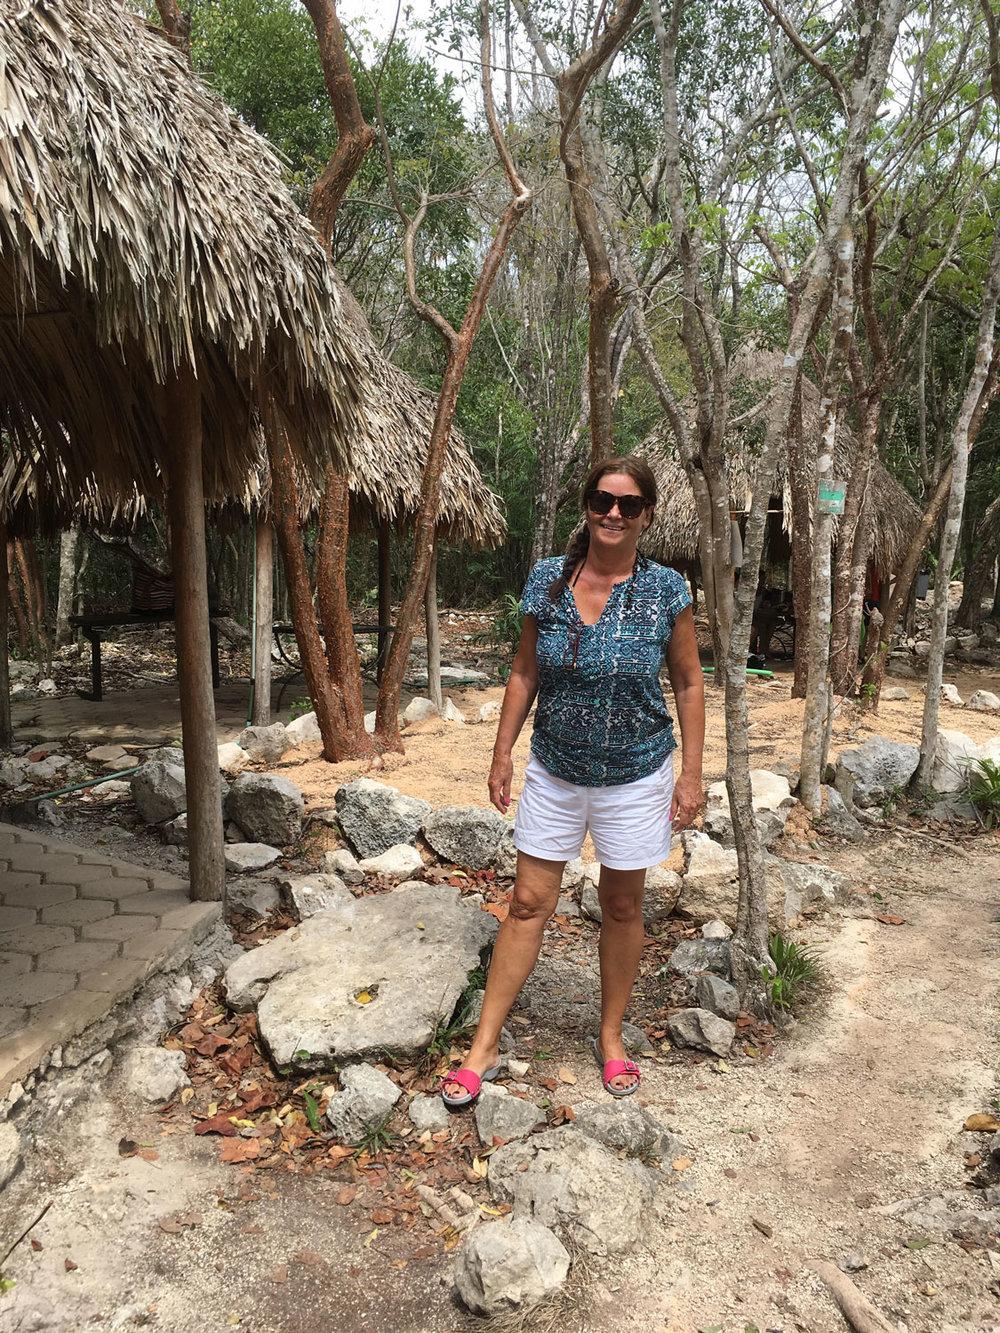 Hammocks_and_Ruins_Riviera_Maya_Mexico_Explore_What_to_Do_Playa_del_Carmen_Cenotes_23.jpg